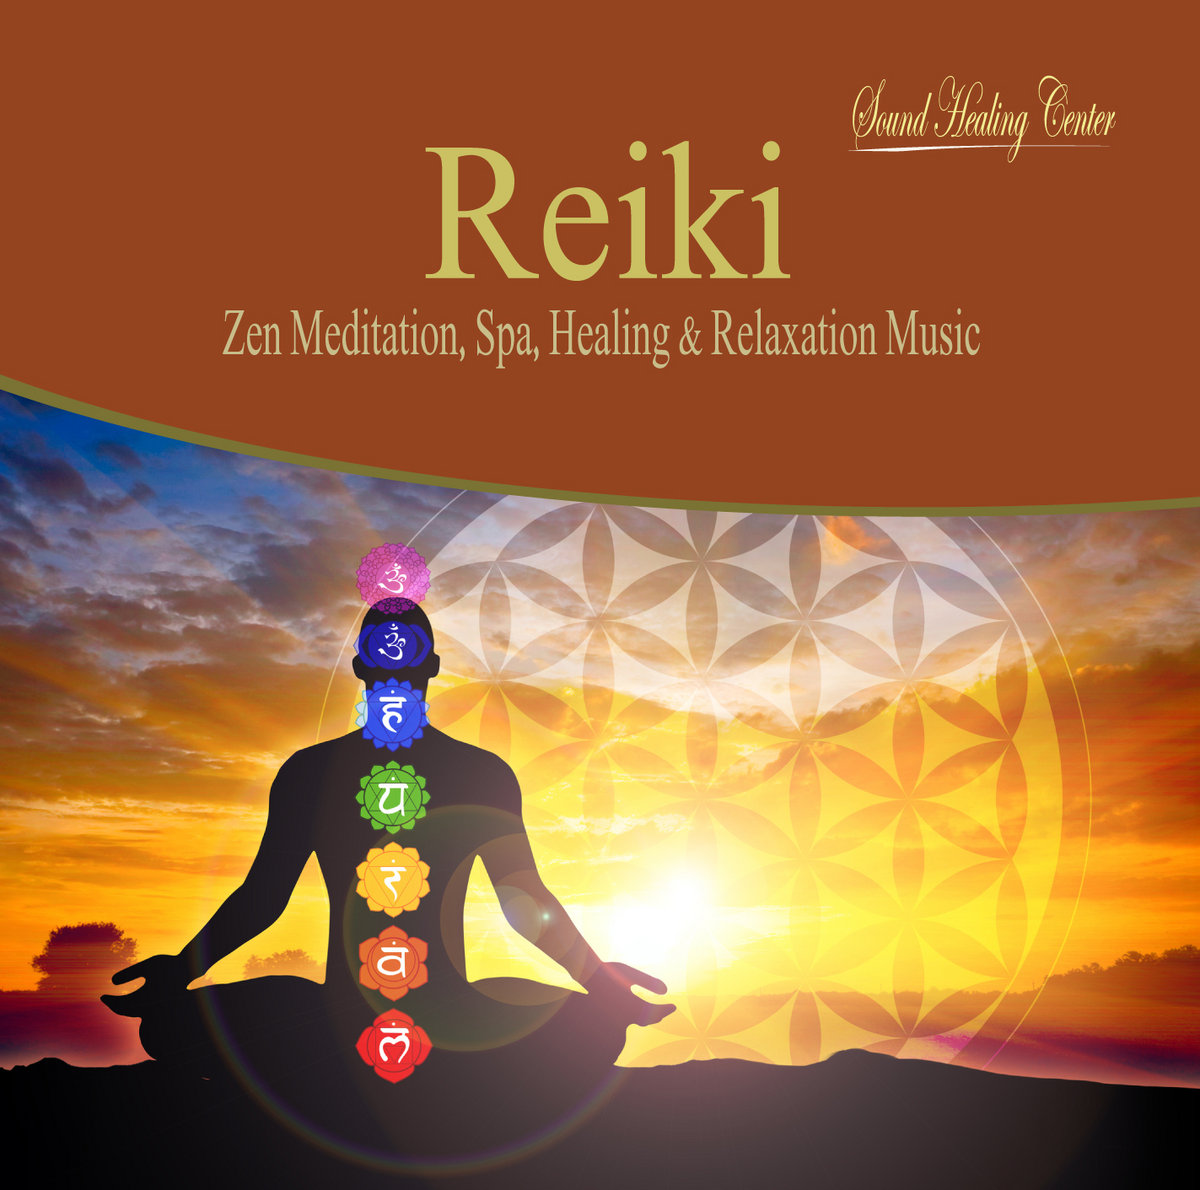 Reiki: Zen Meditation, Spa, Healing & Relaxation Music   Relaxation